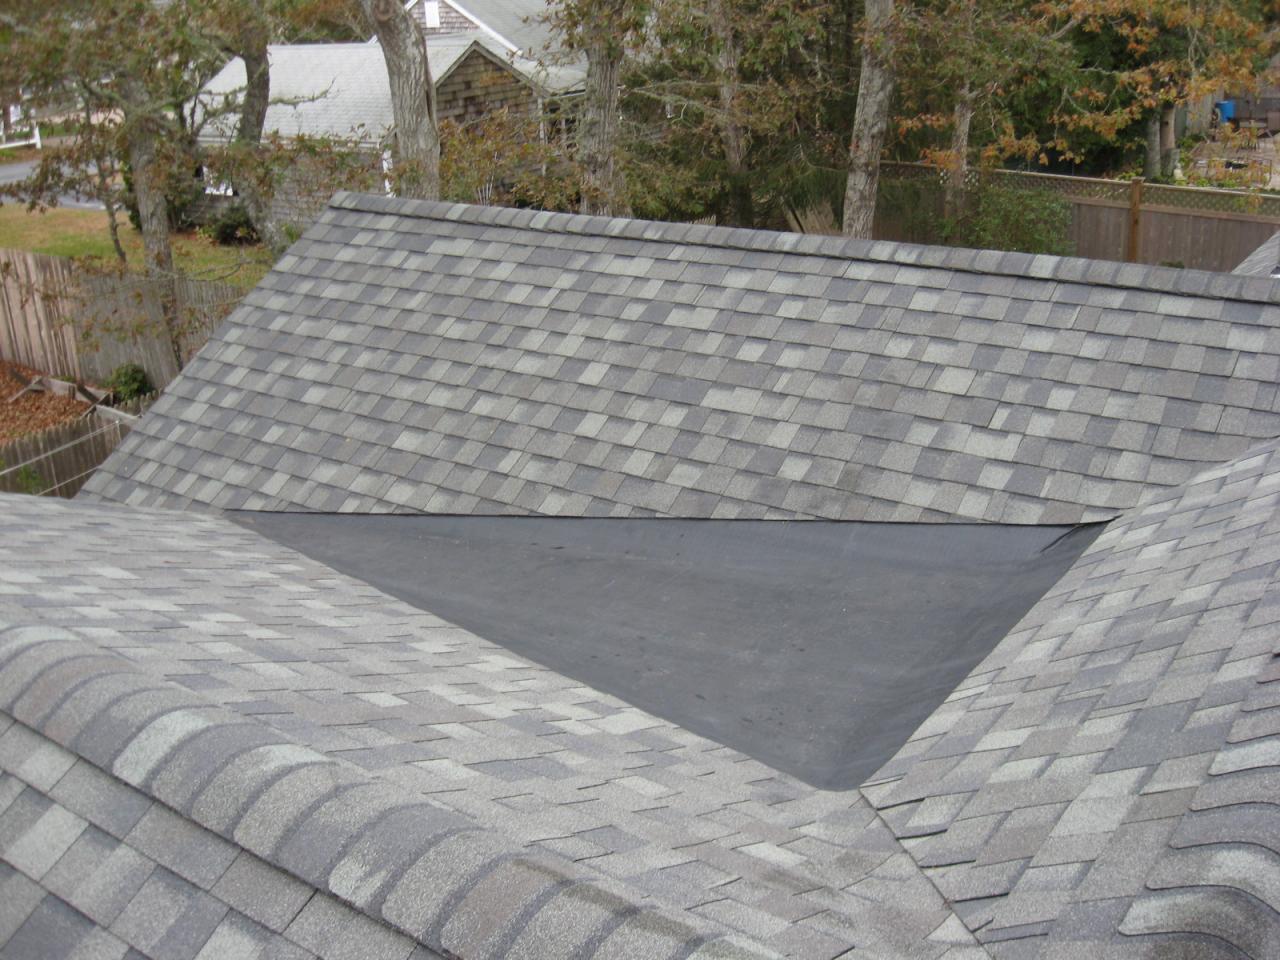 Asphalt Shingle Roofs Portfolio Torontoroofing Ca